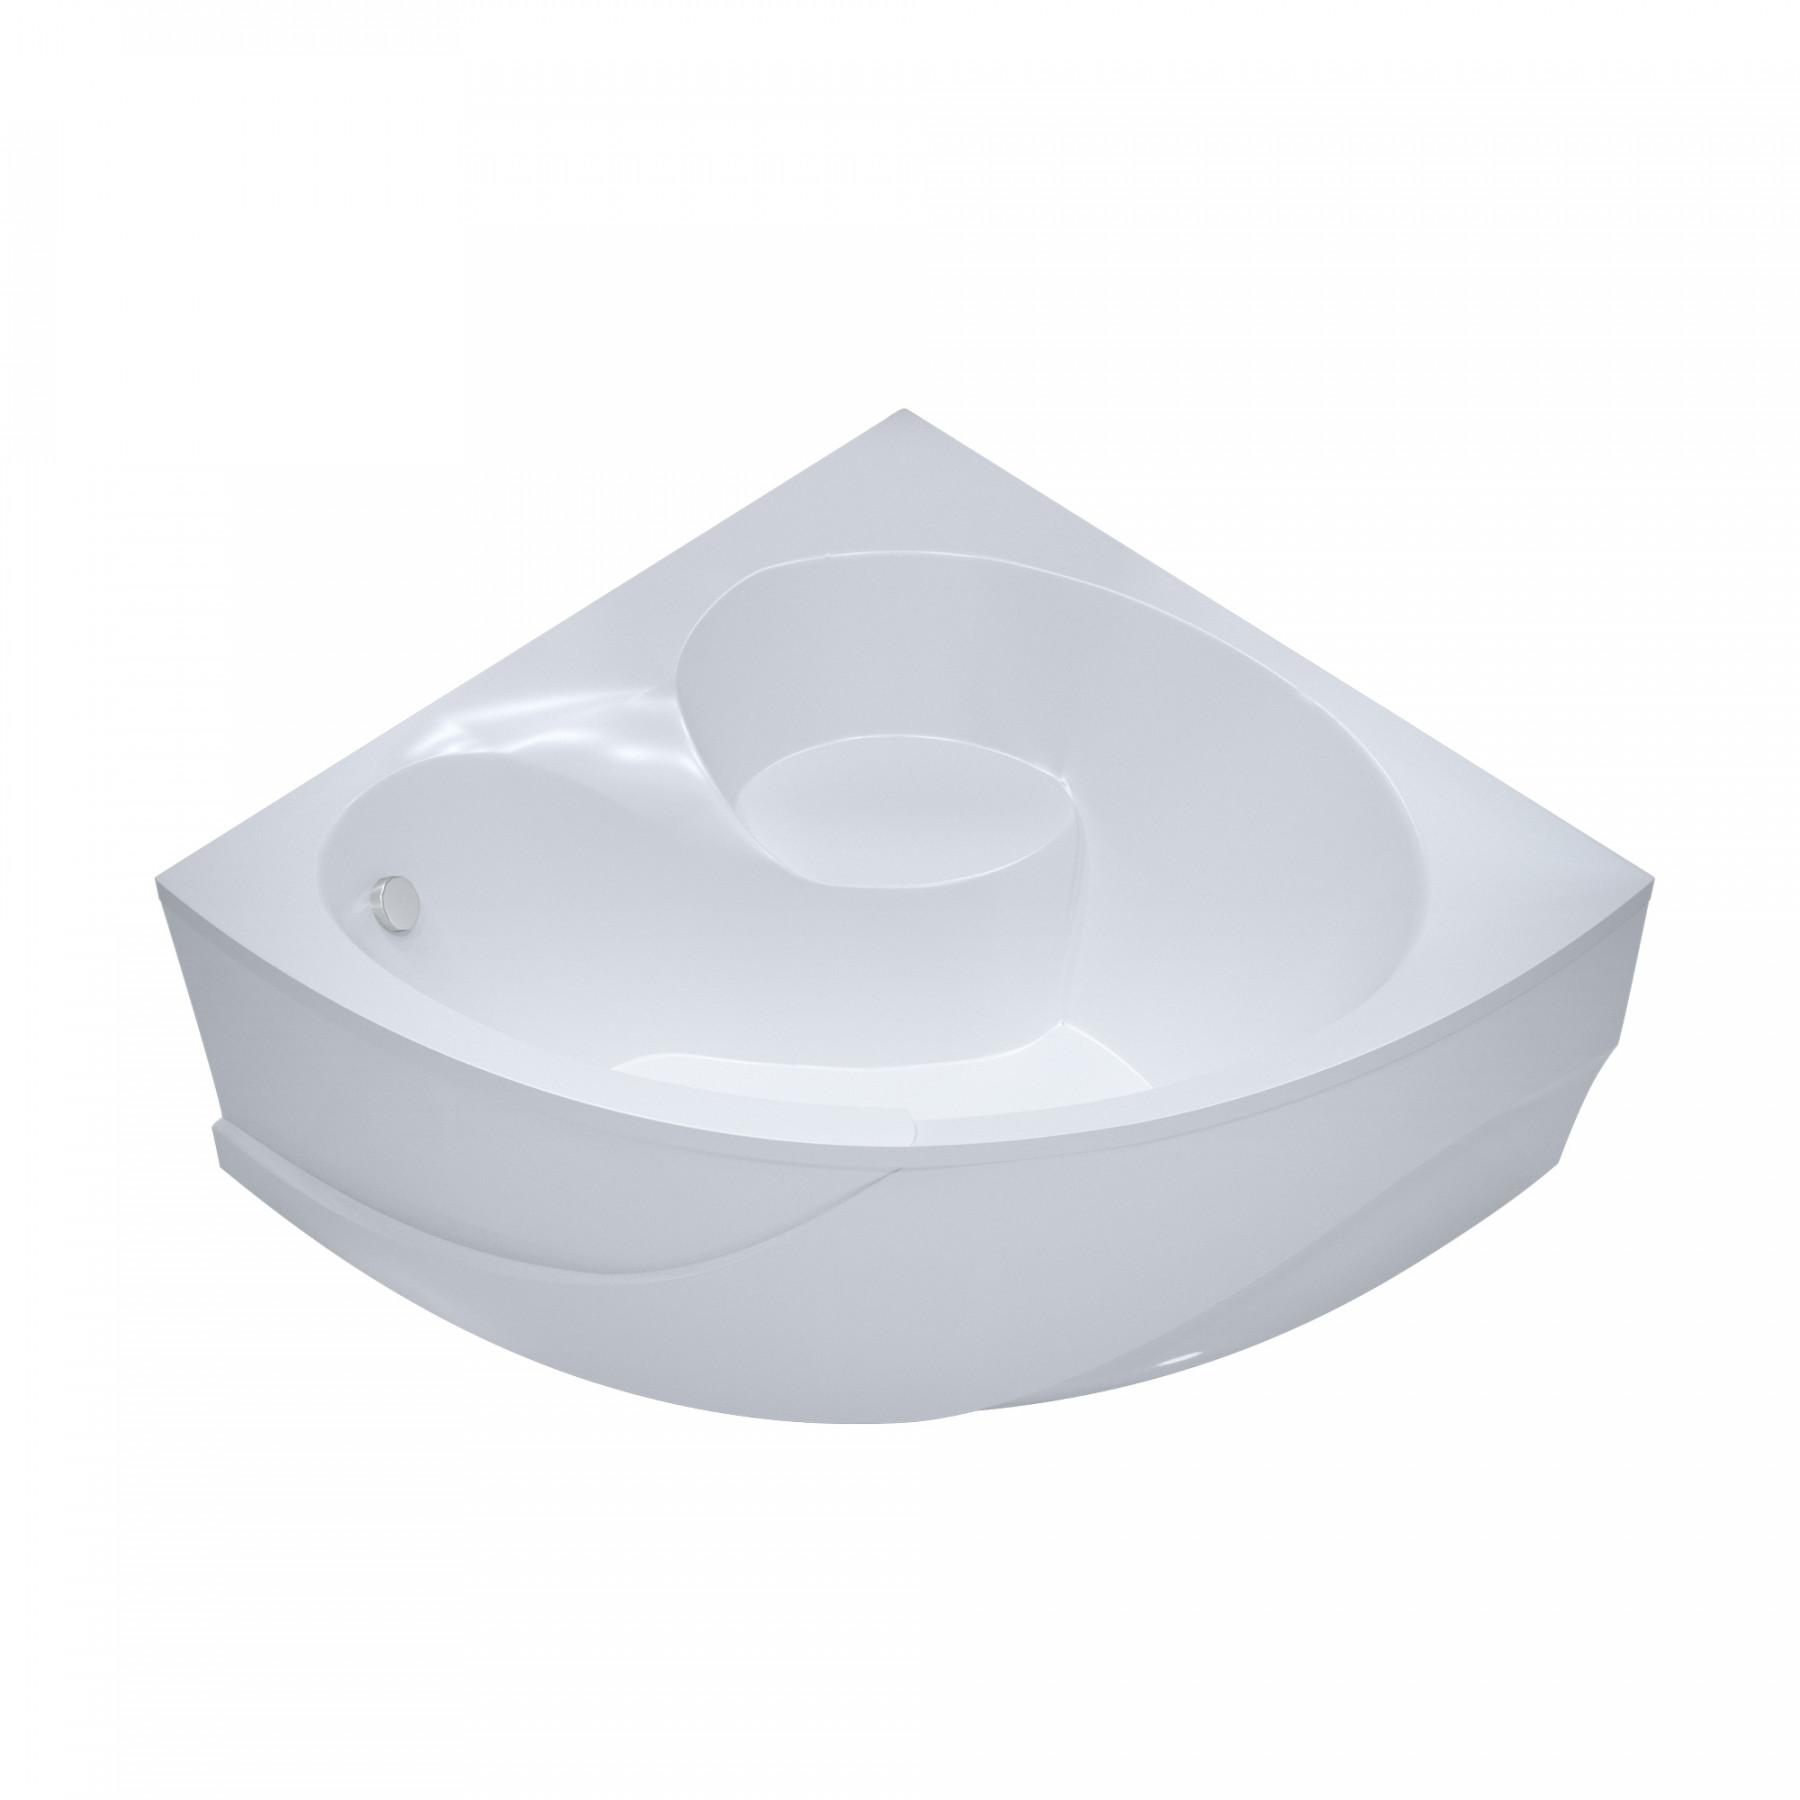 Акриловая ванна Triton Эрика 140x140